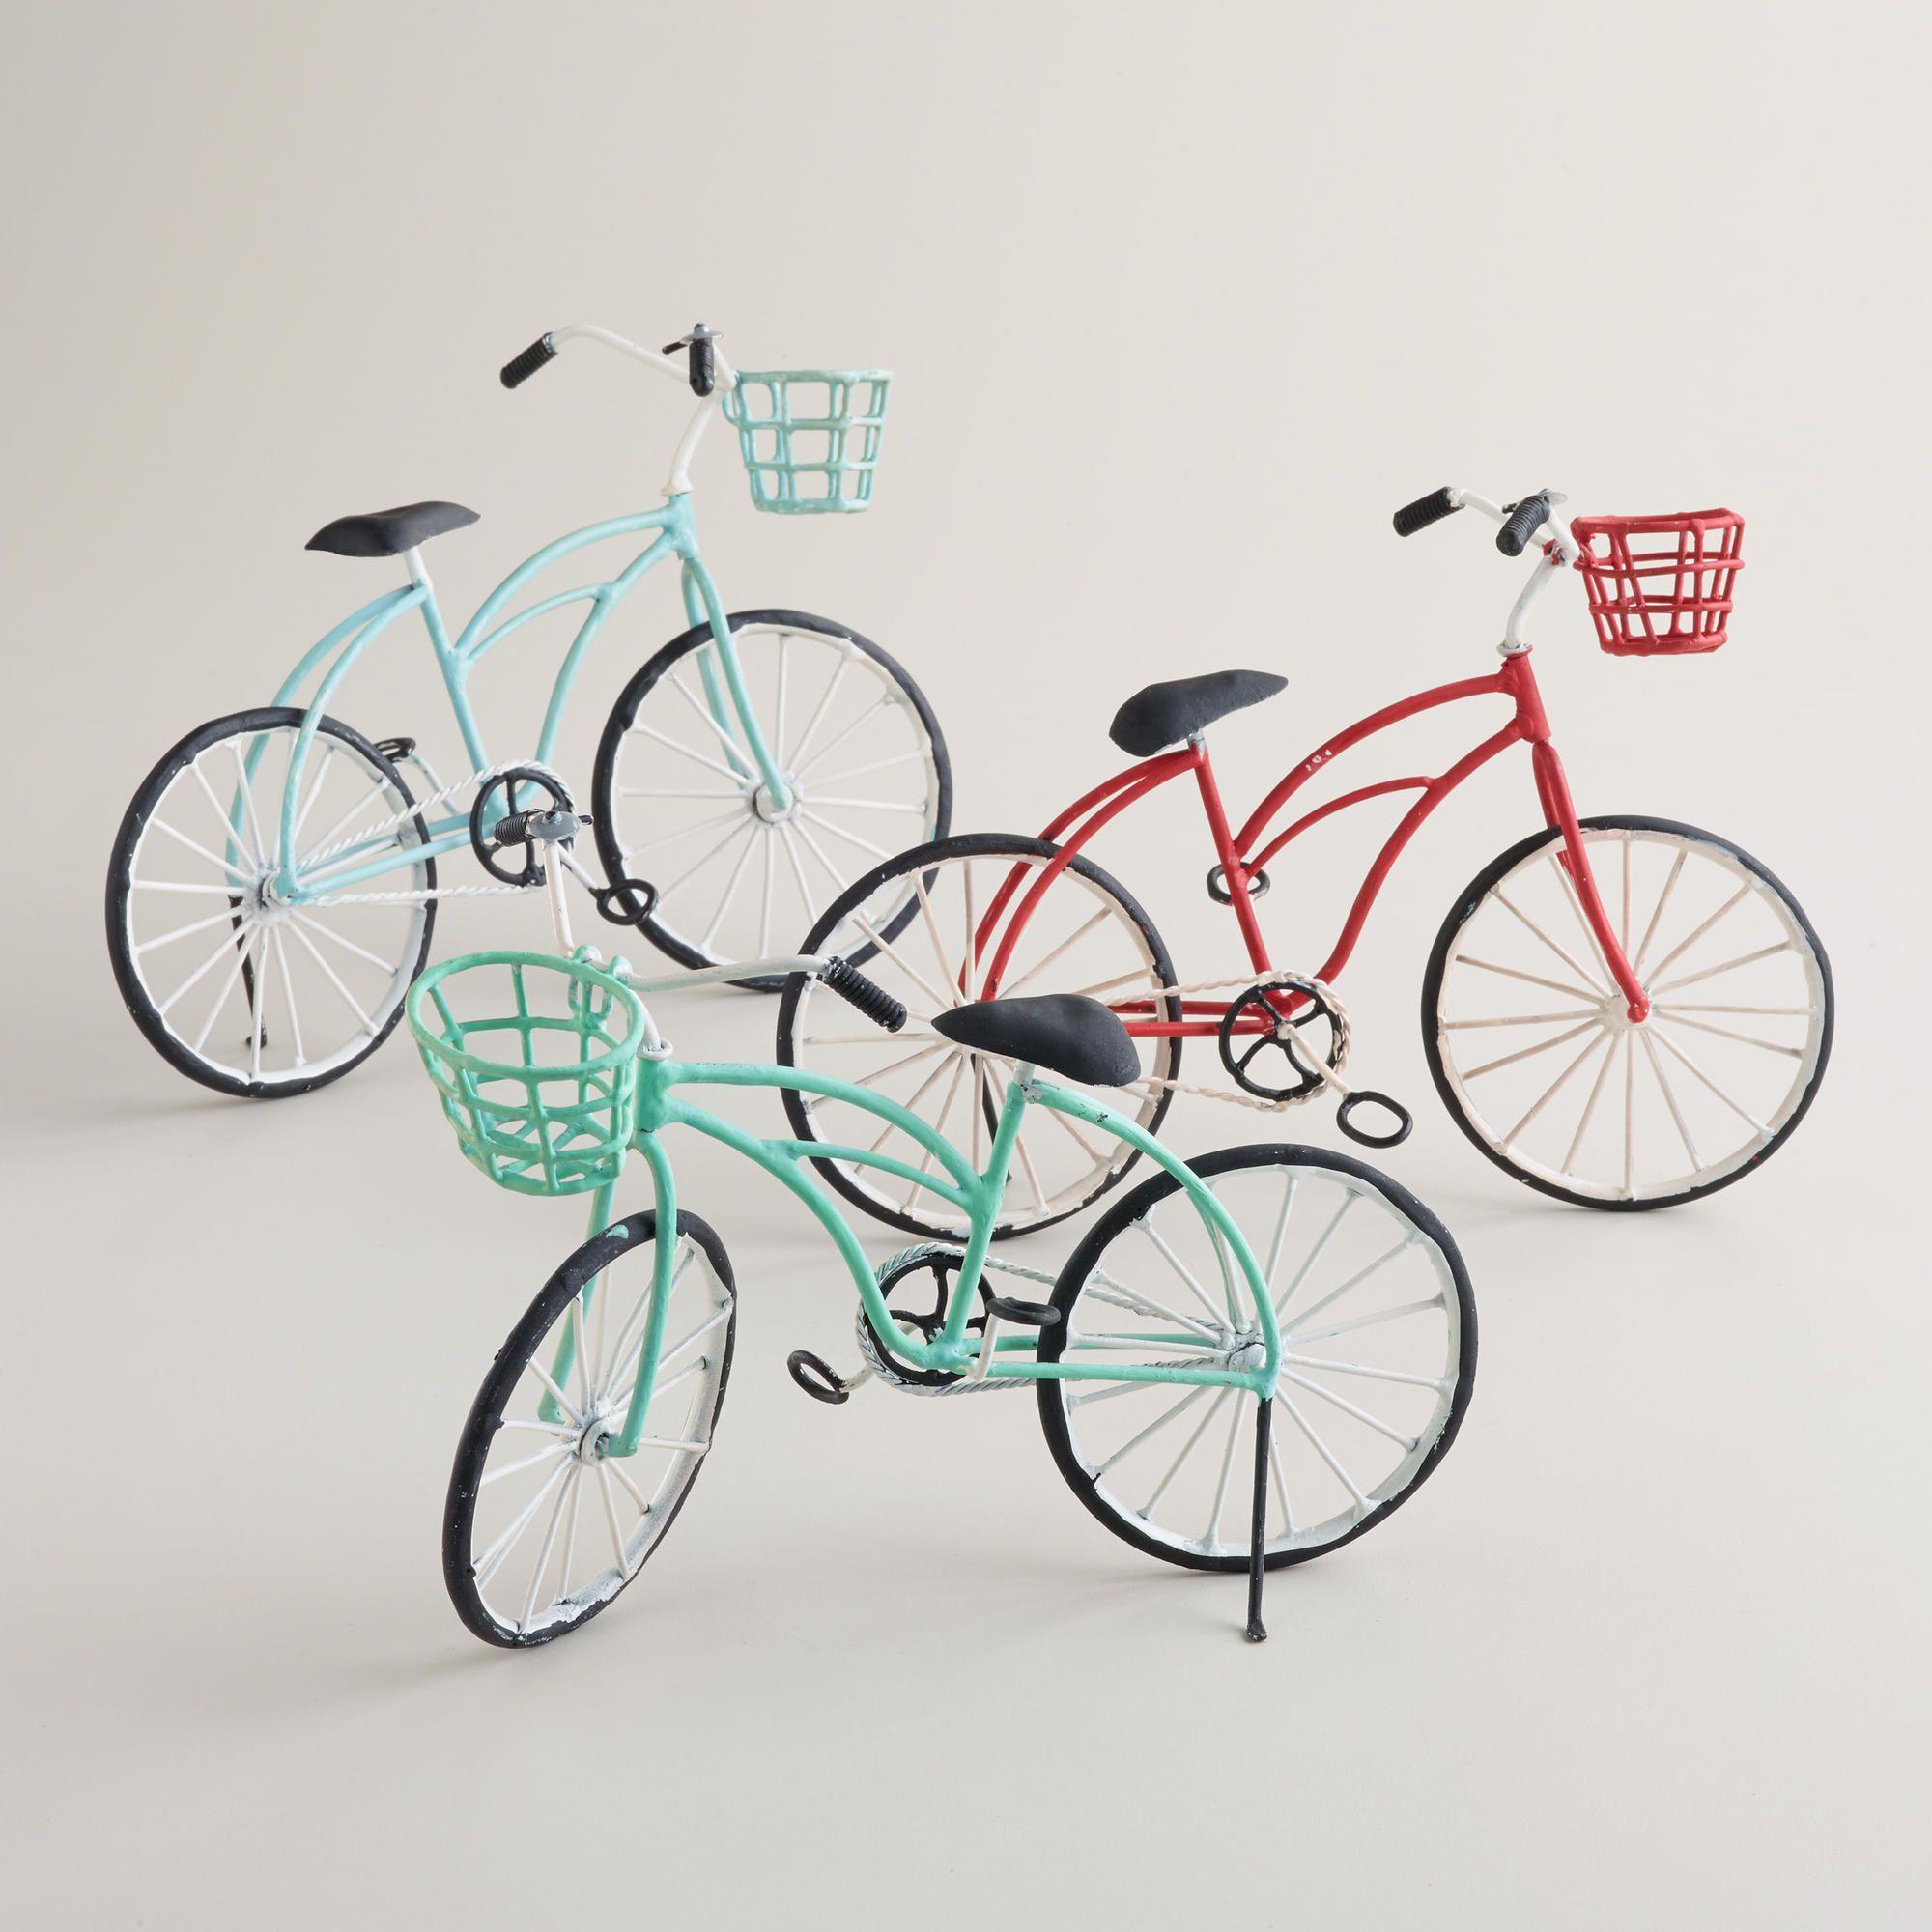 Metal Bicycle Decor Set Of 3 World Market Bicycle Decor Bike